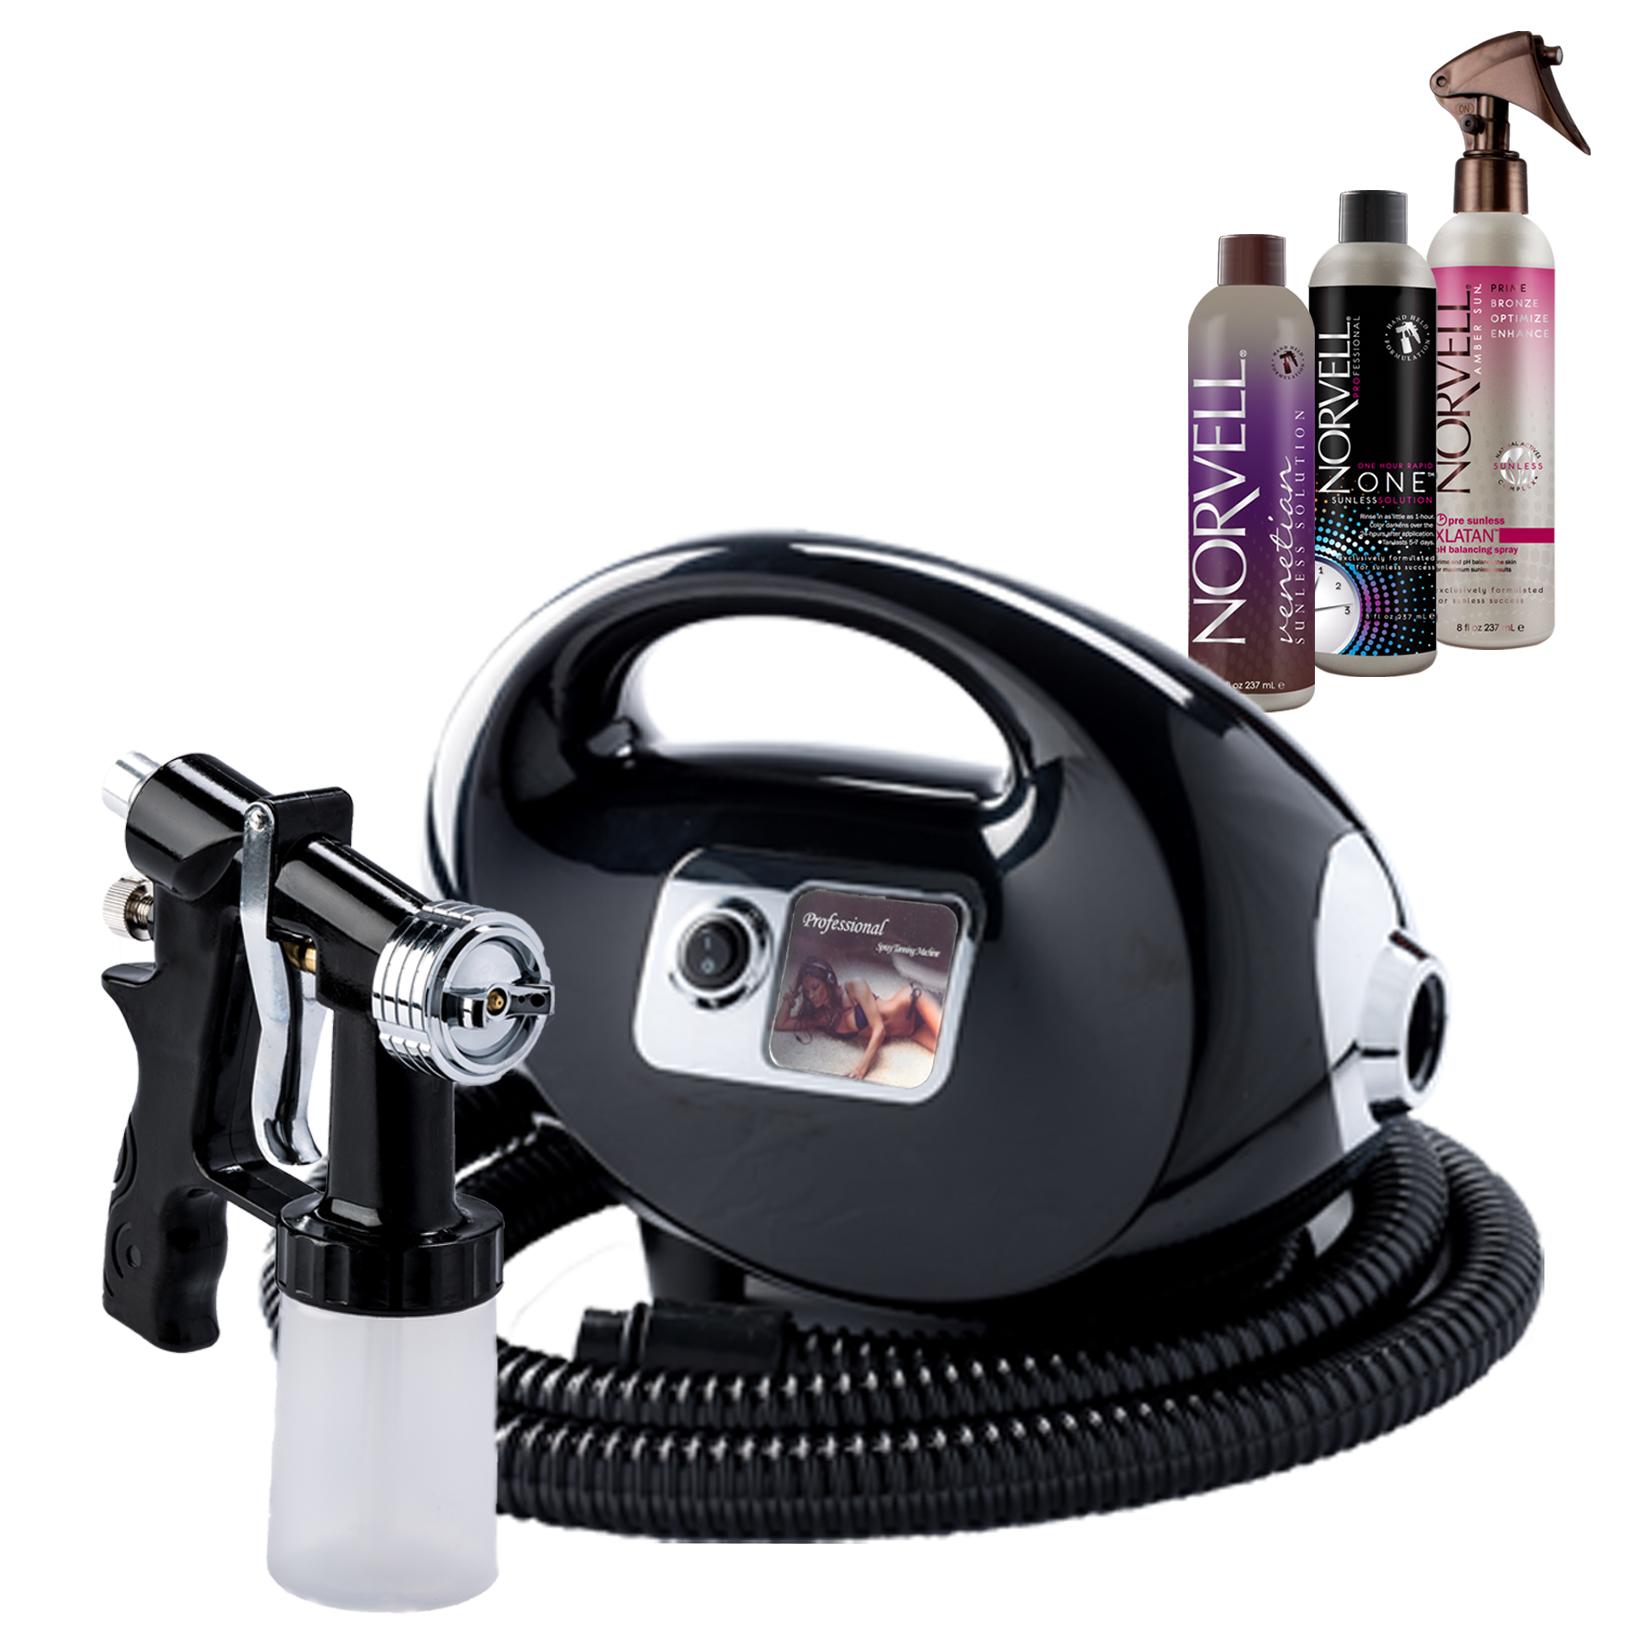 Fascination Spray Tanning Kit Machine Bundle with Tanning...